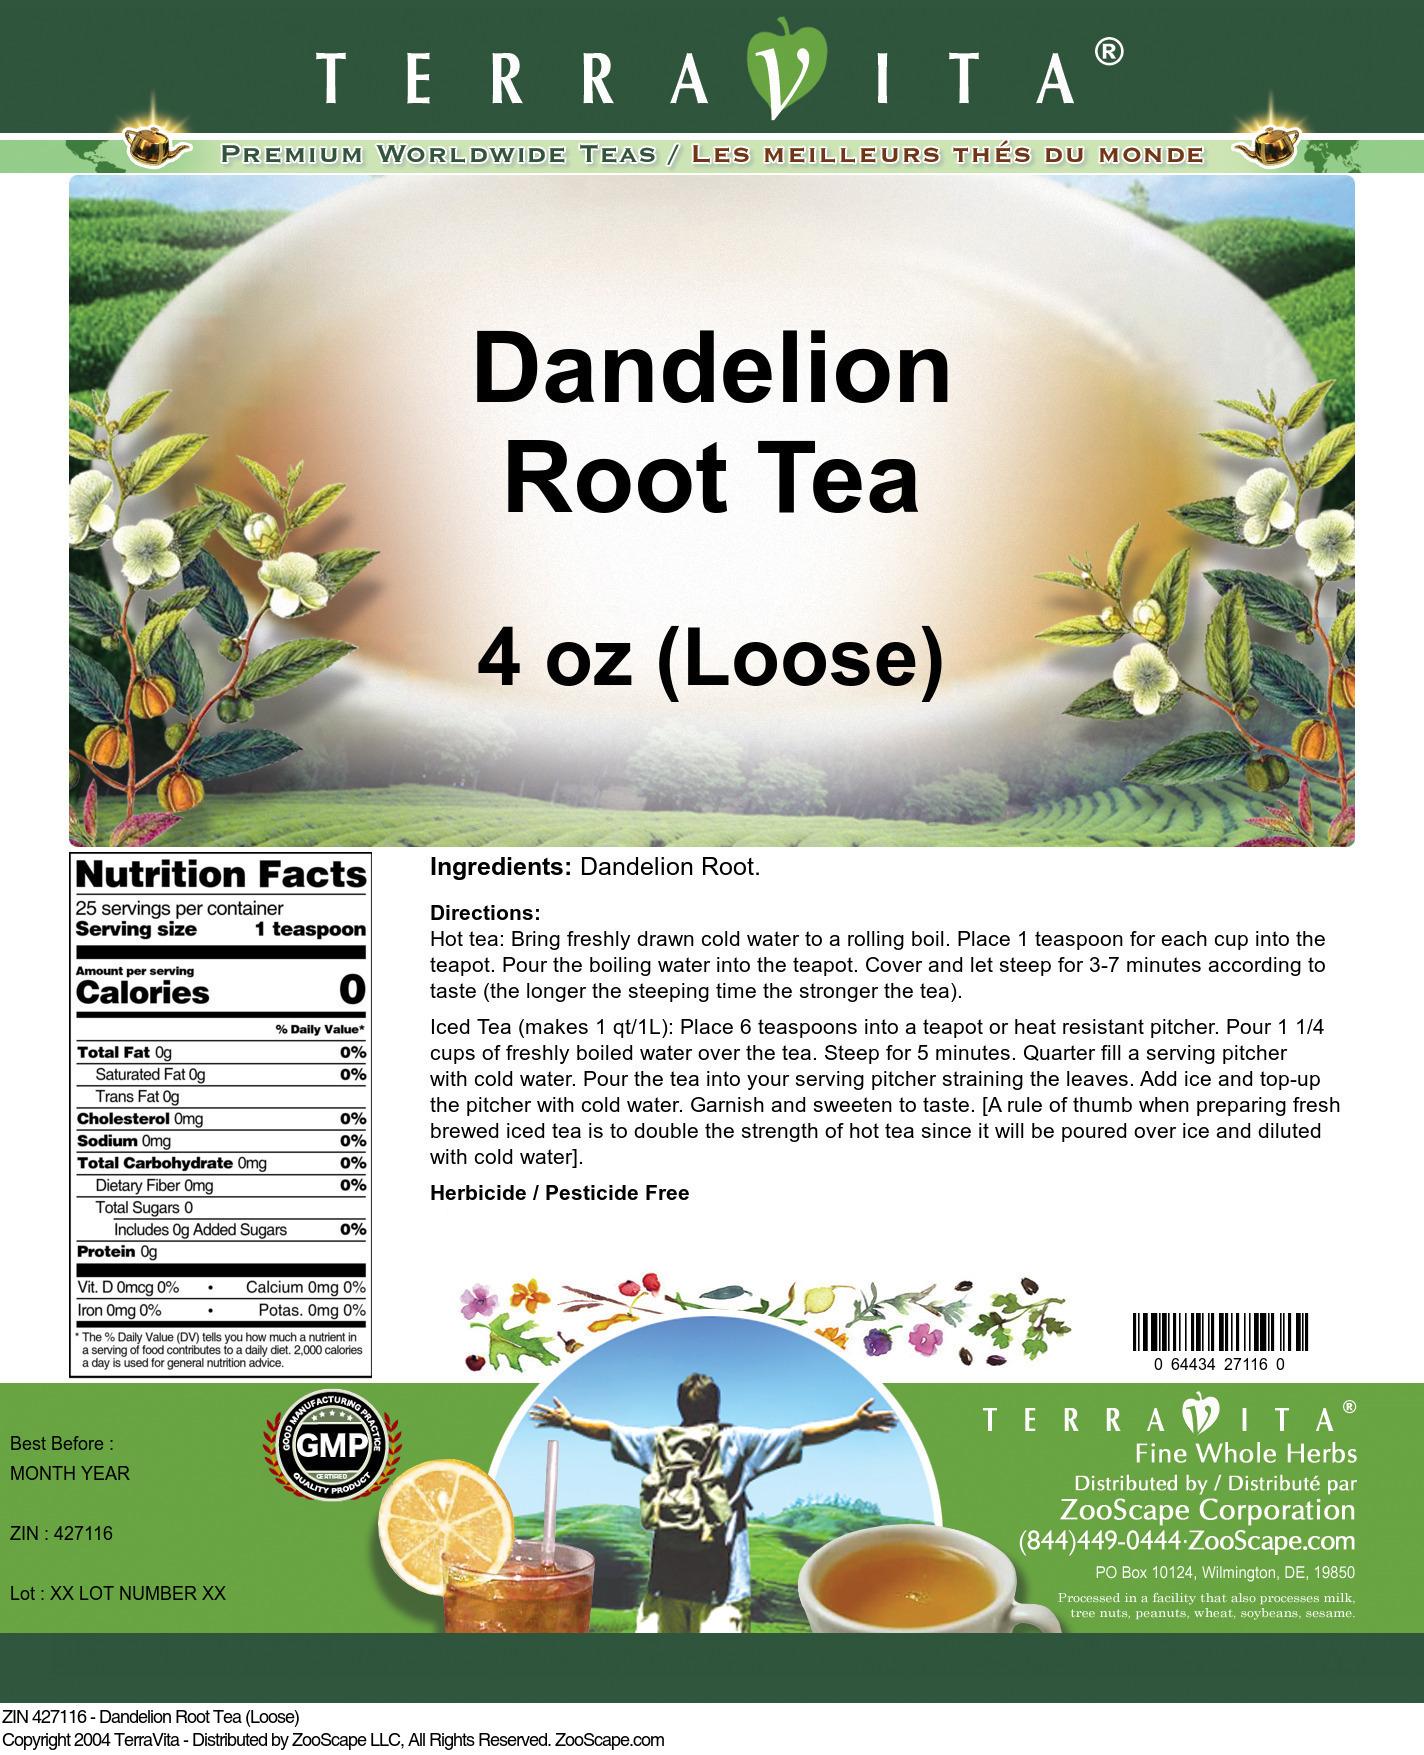 Dandelion Root Tea (Loose) - Label